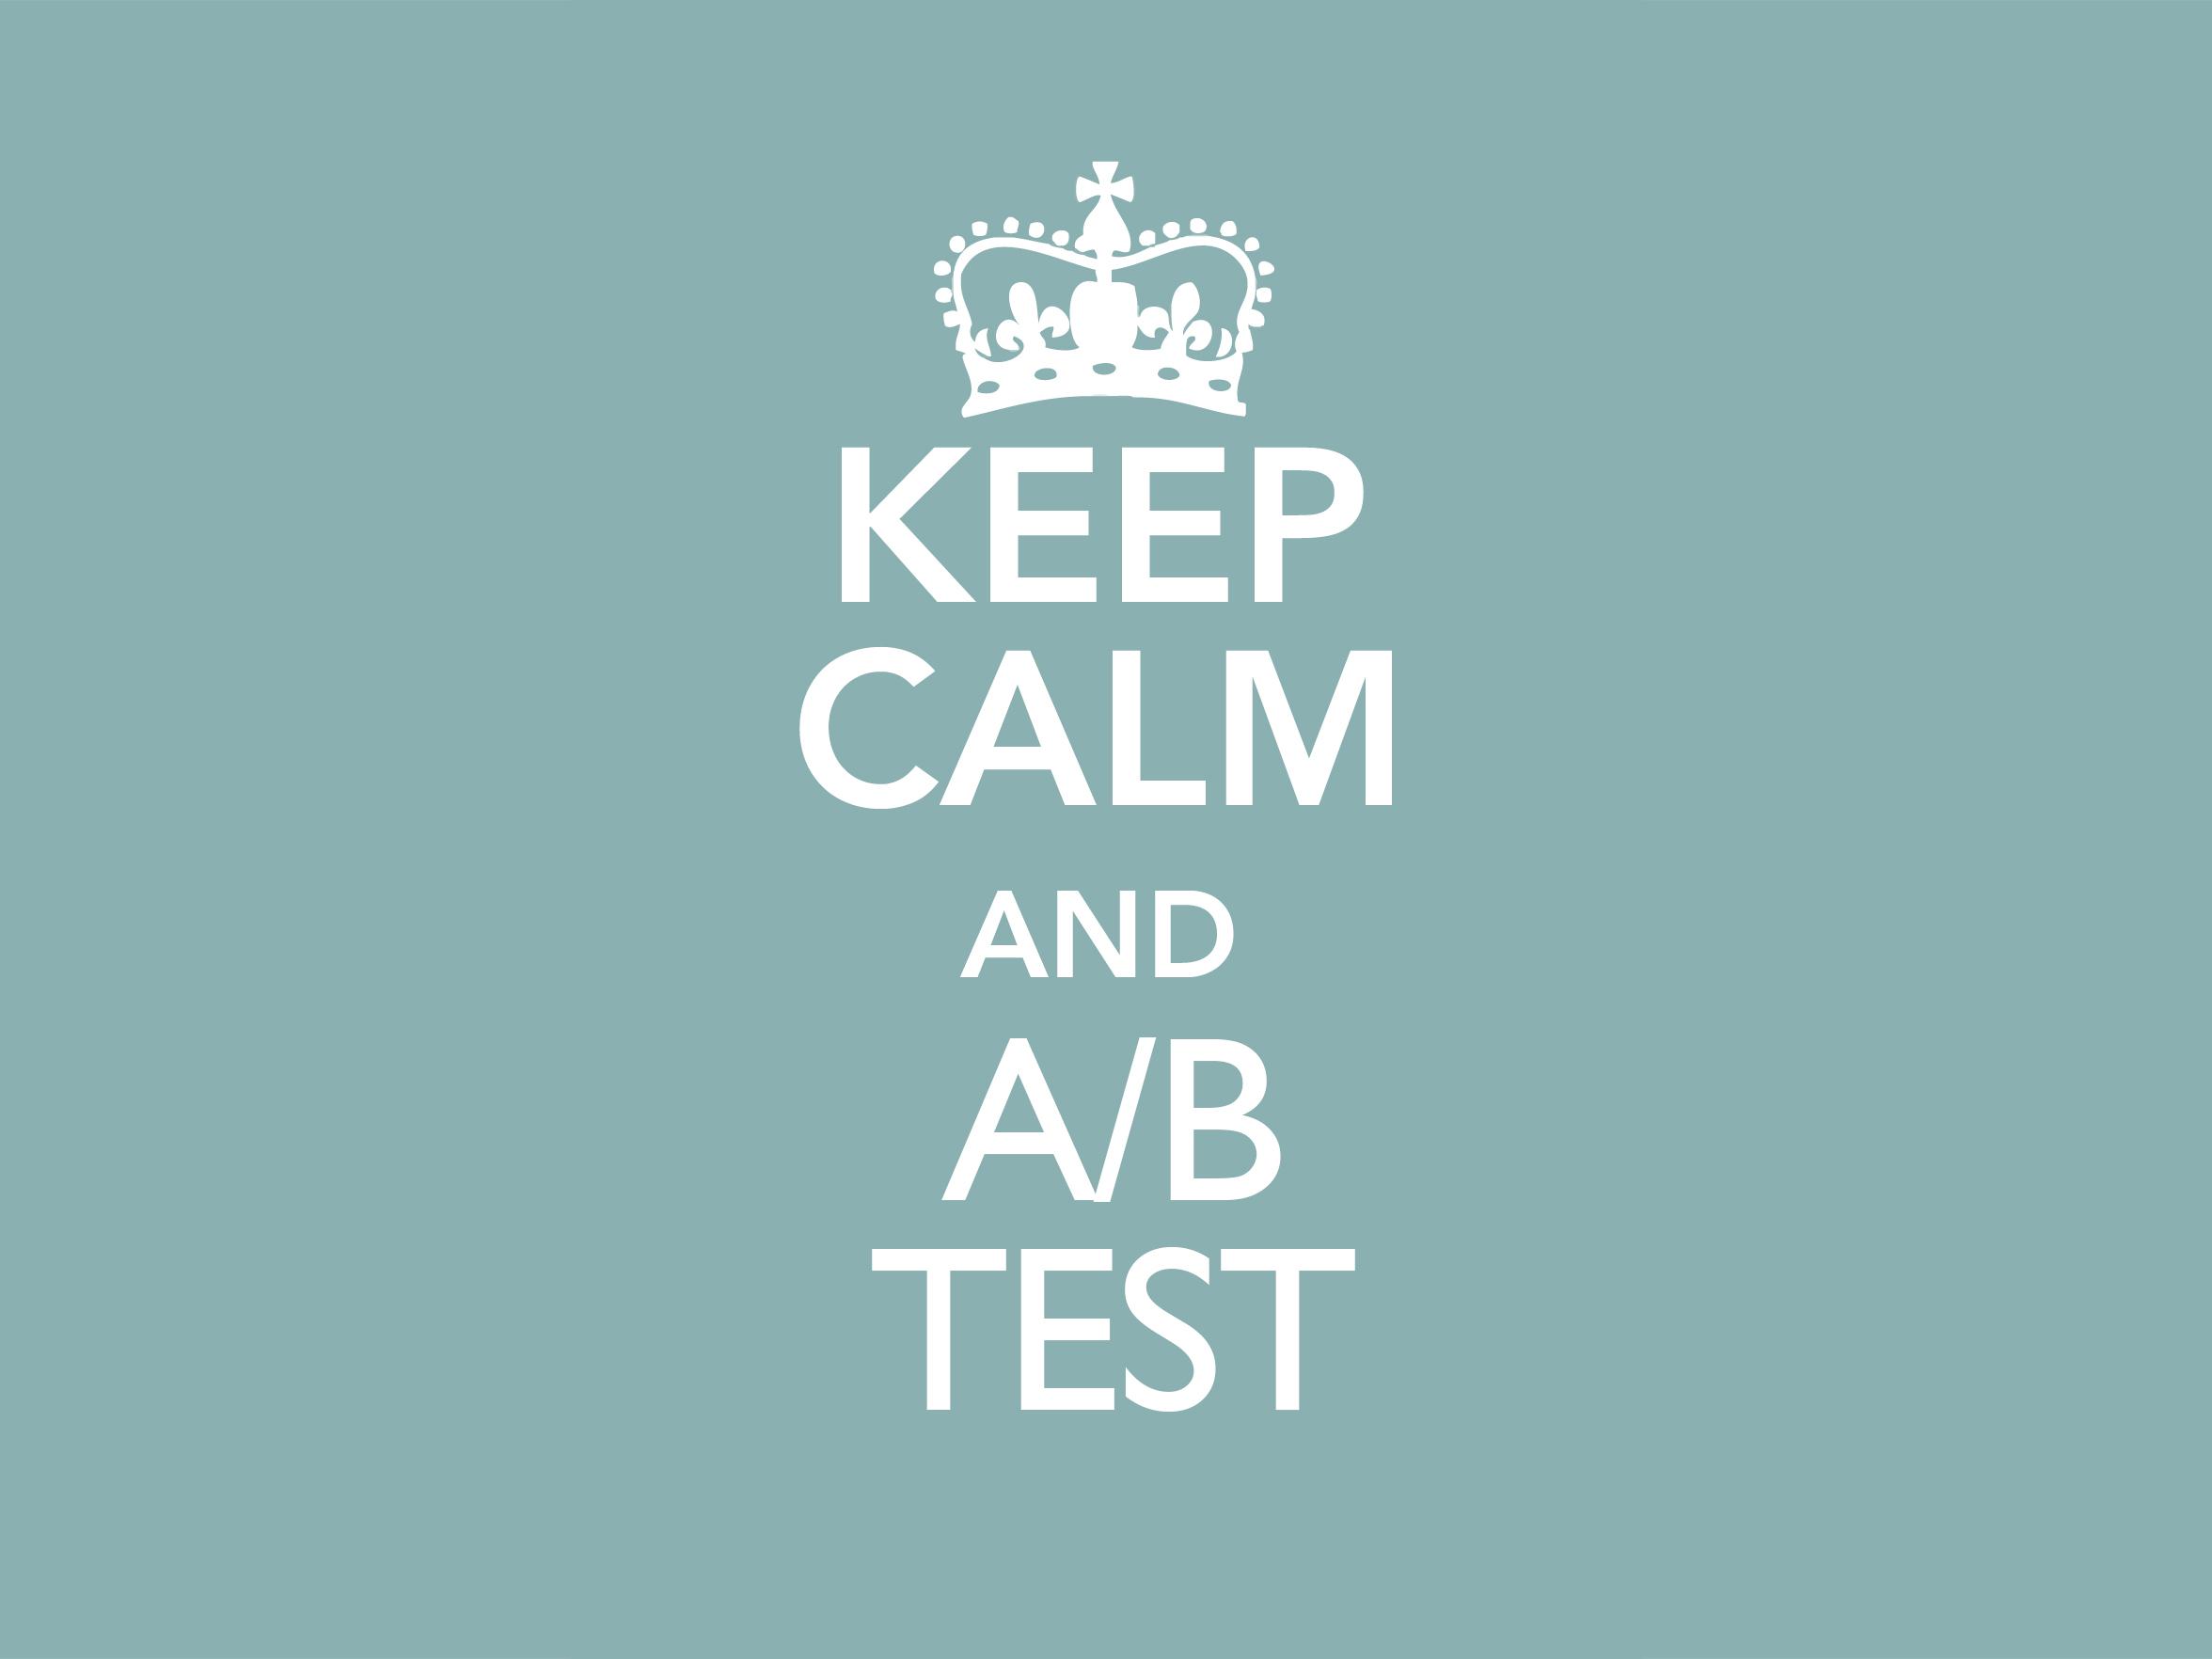 A/B testing benefits